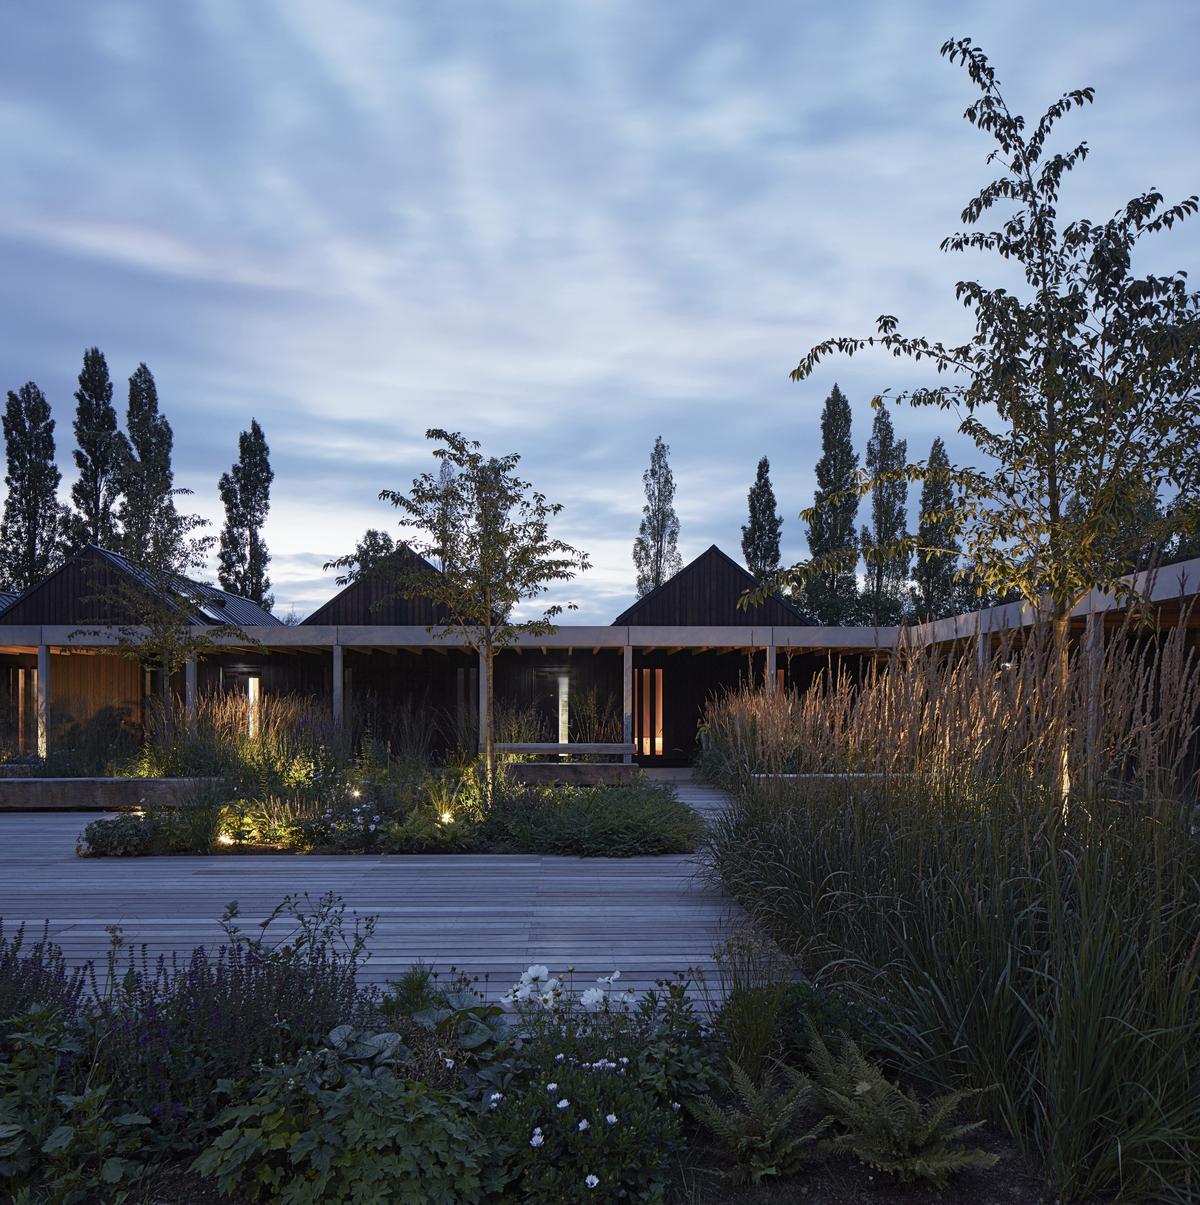 Vajrasana Buddhist Retreat Centre, Photo by Dennis Gilbert